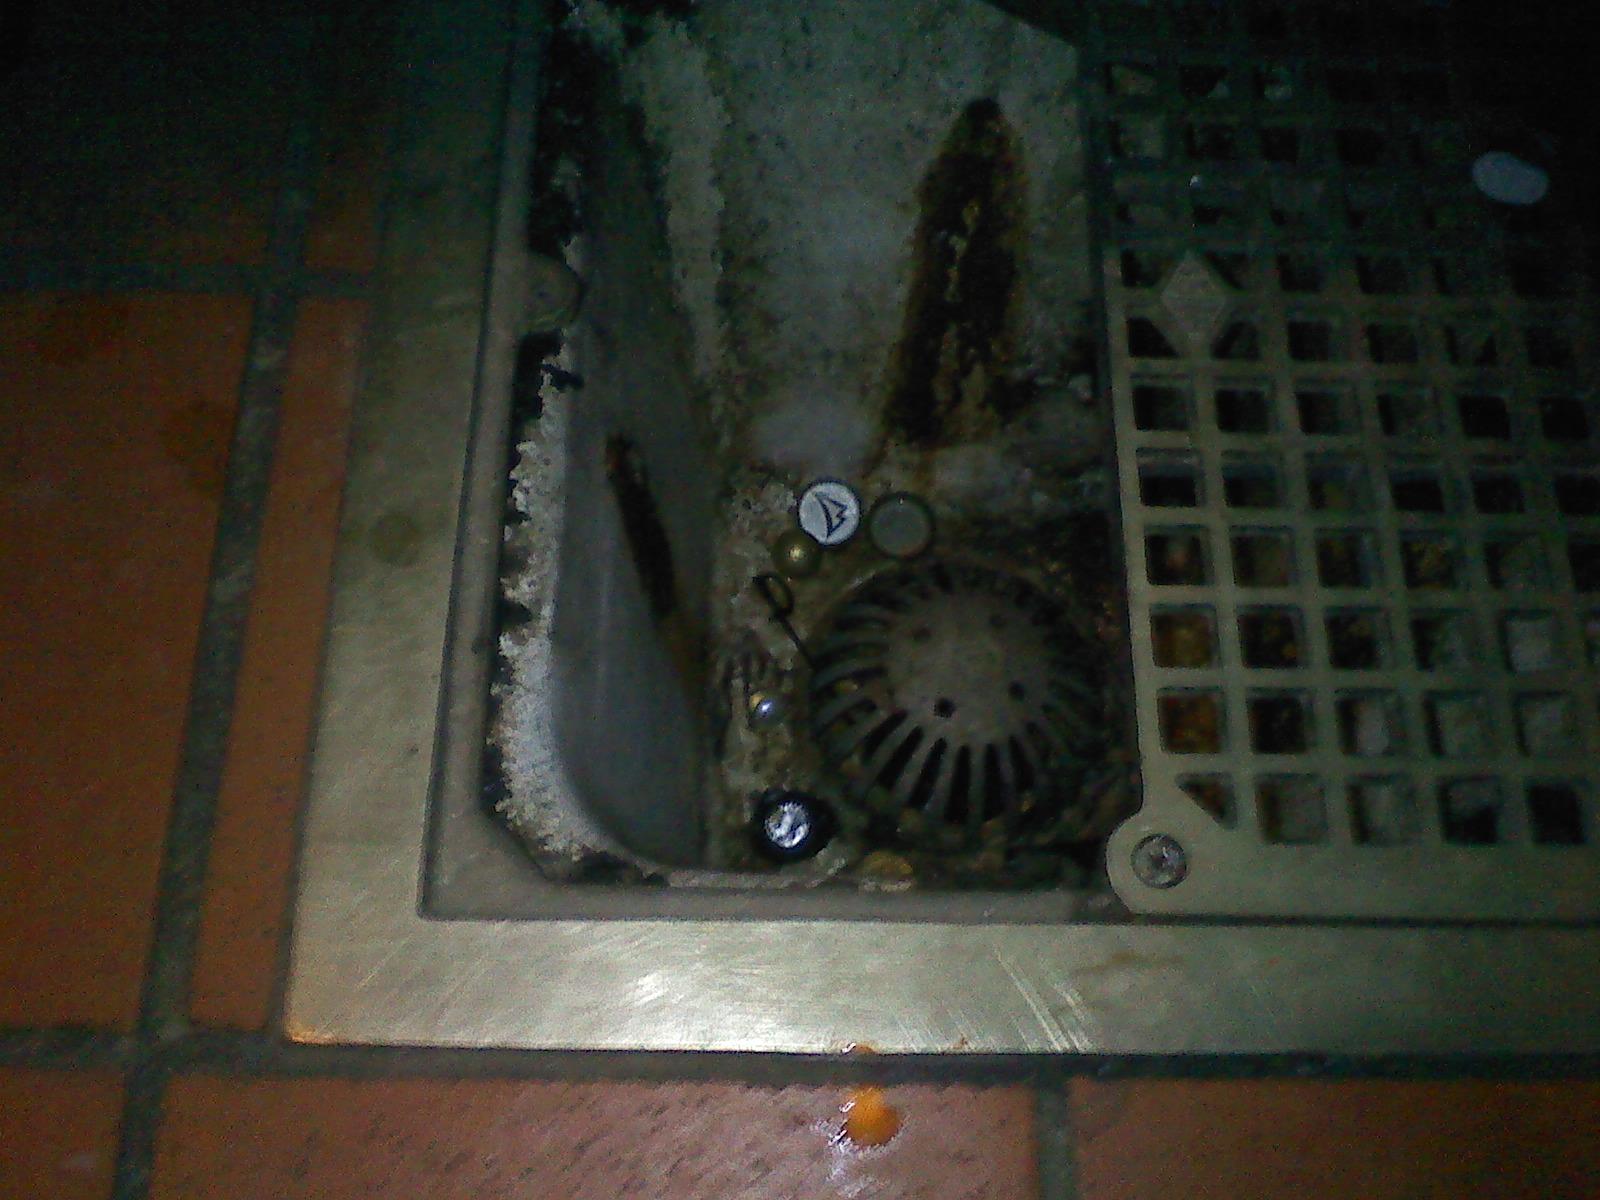 Drain flies bathroom - An Example Of A Dirty Drain Protek Treated For Drain Flies